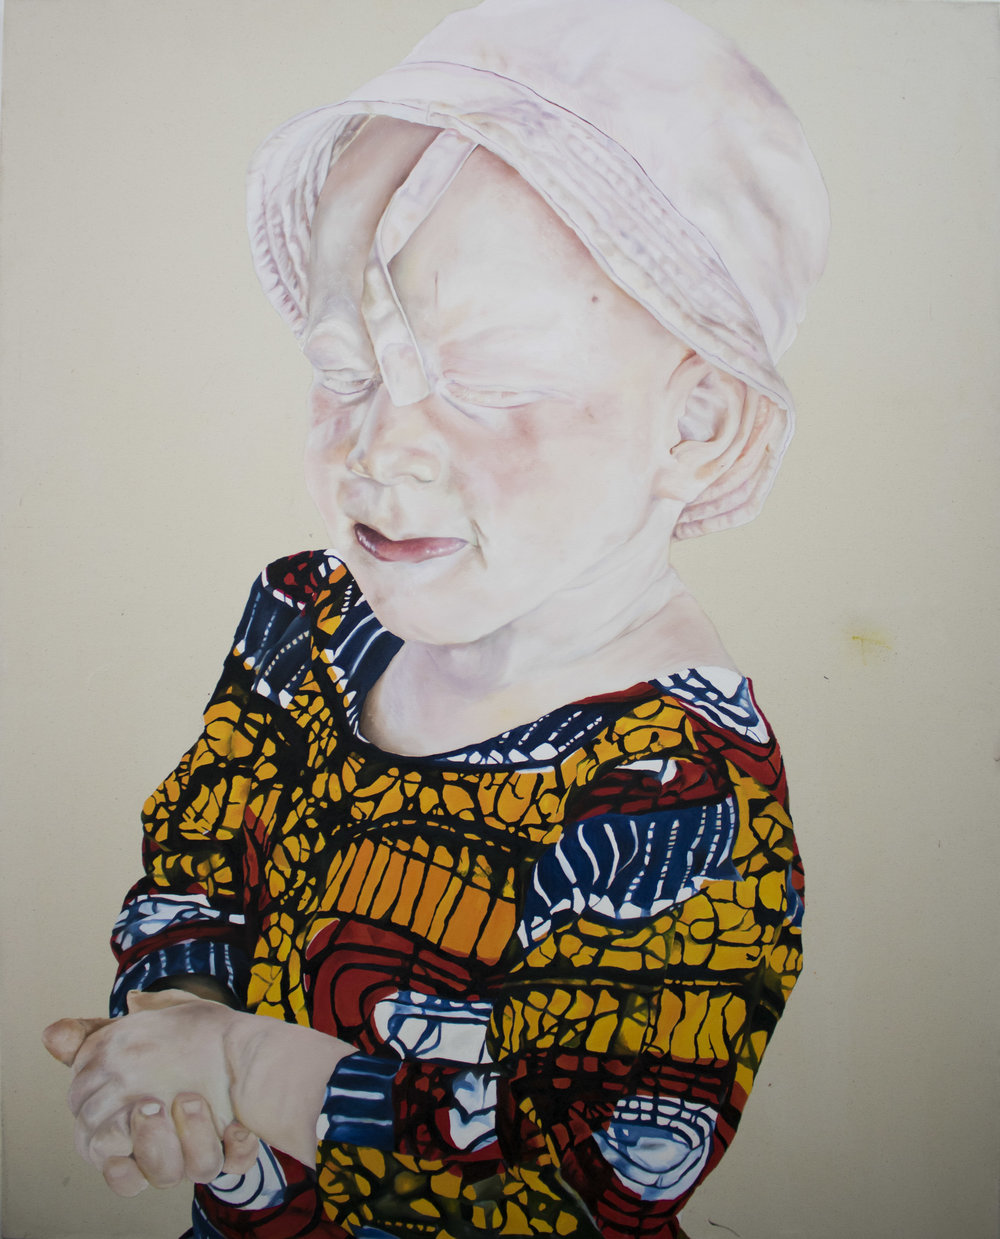 Annie-Marie Akussah, JUDIE, Oil paint on Canvas, 150 cm x 120 cm,  https://www.anniemarieakussah.com